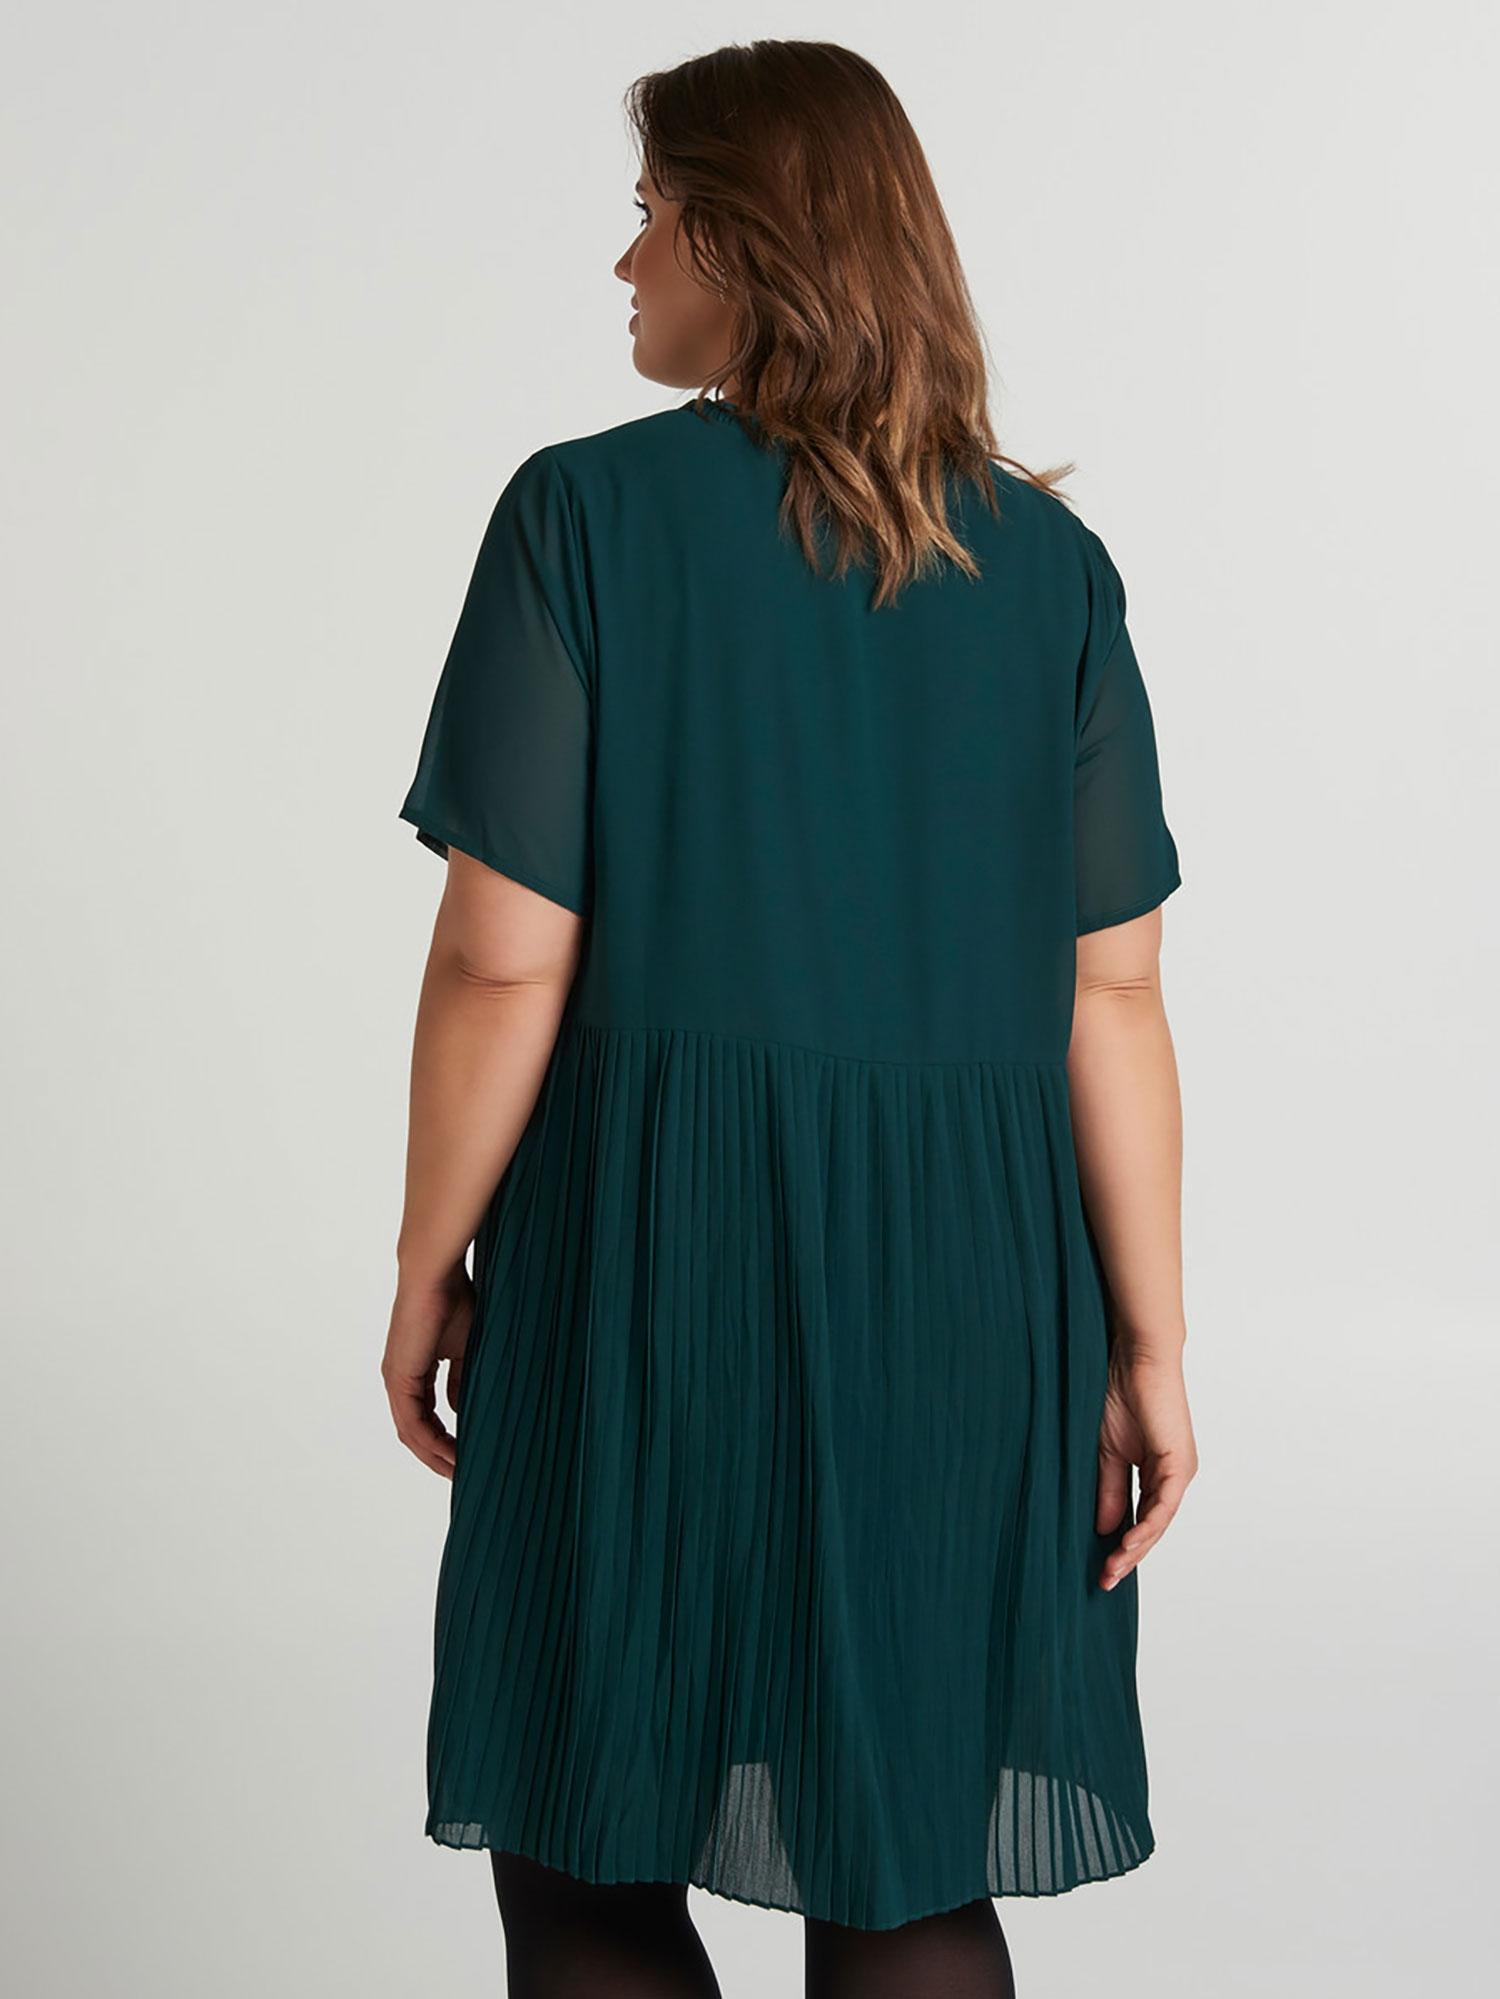 Junarose Blå kjole med plisséunderdel